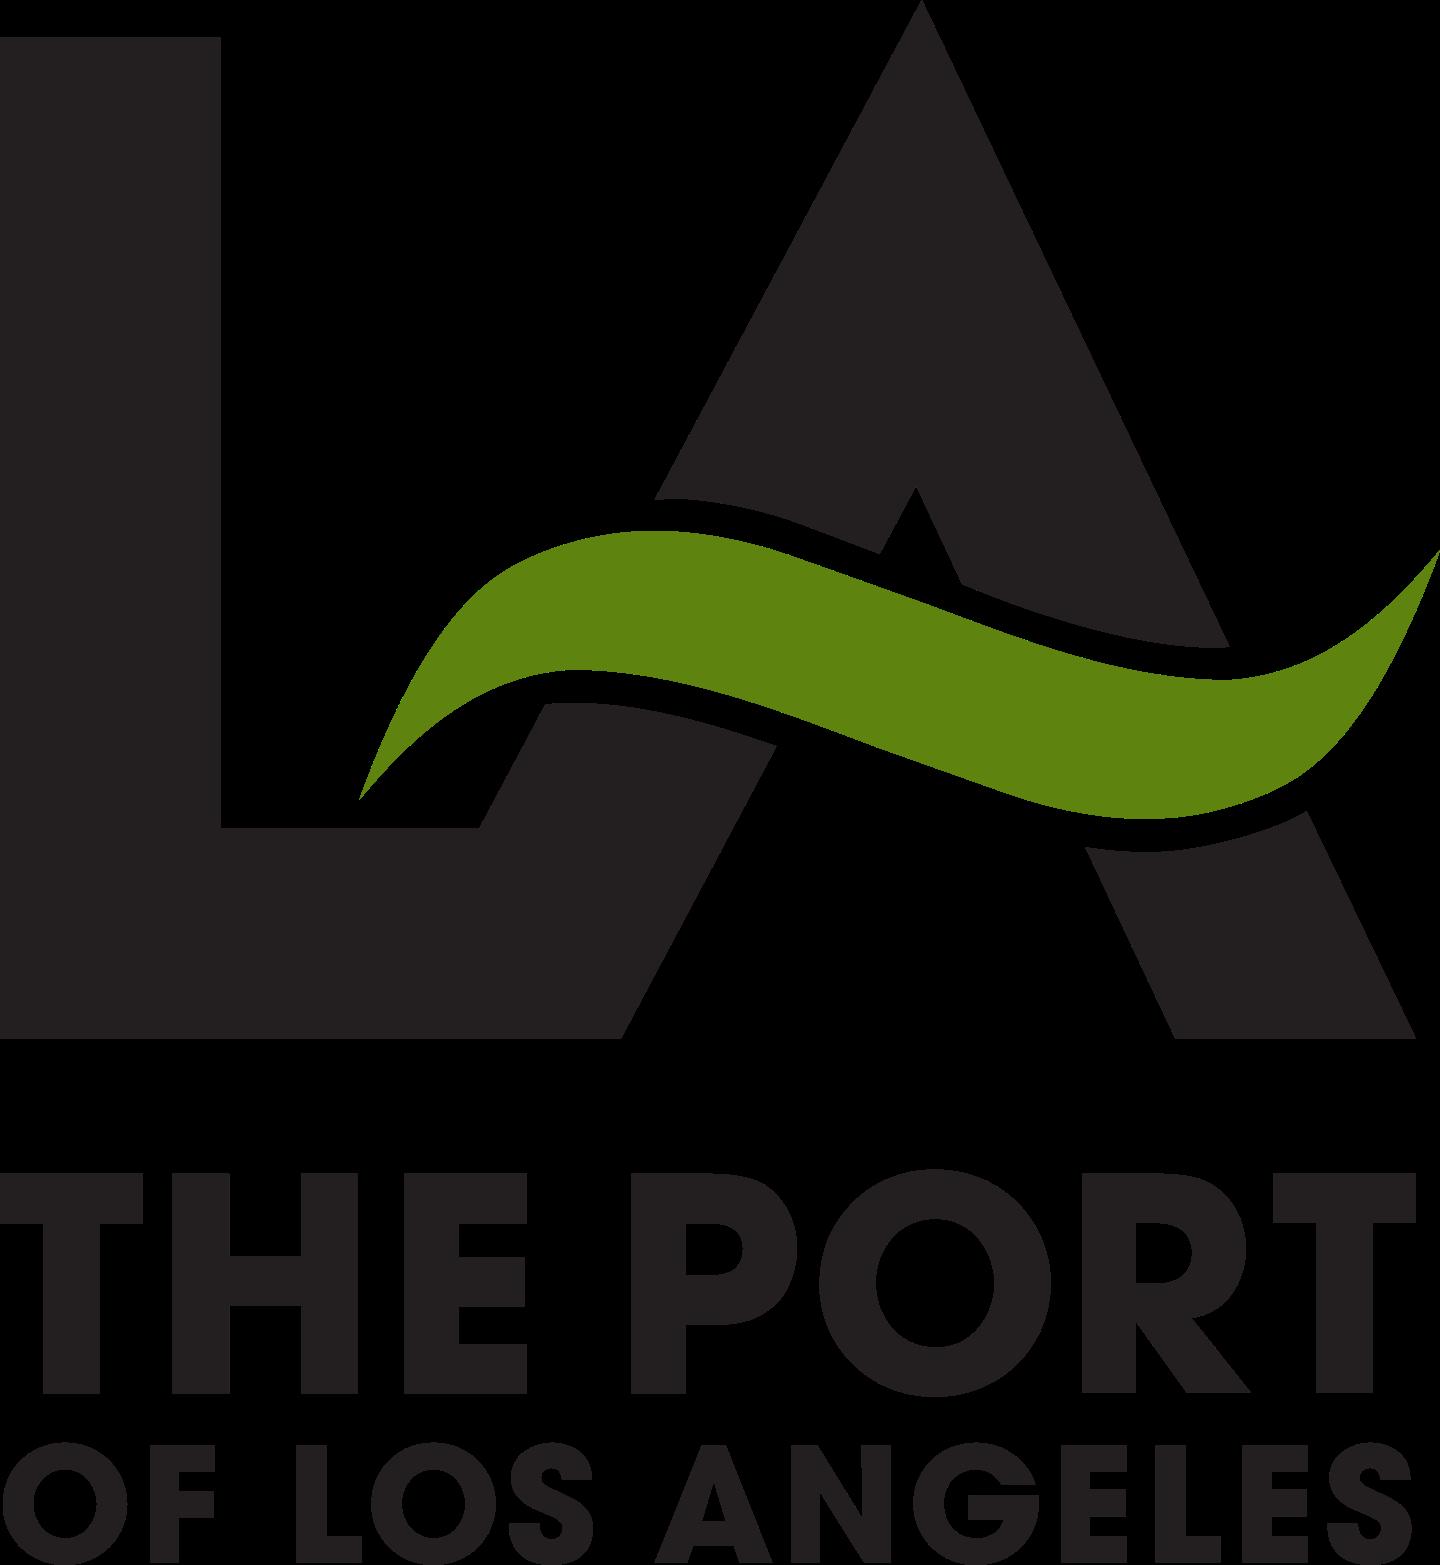 port of los angeles logo 3 - Port of Los Angeles Logo